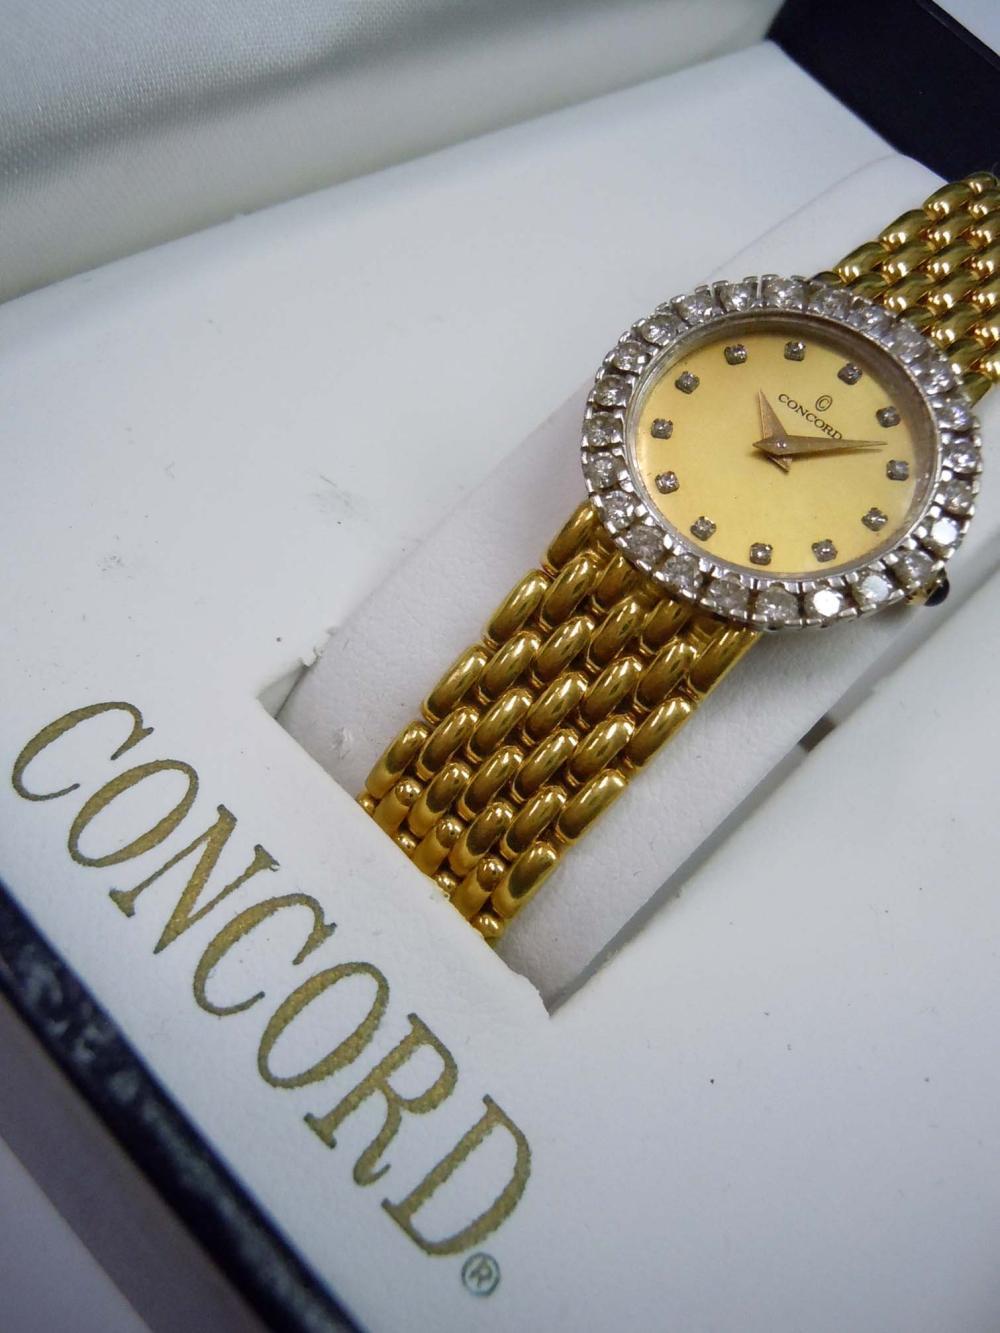 LADIES CONCORD 14Kt GOLD 1.25Ct CHAMPAGNE DIAMOND DIAL w Box